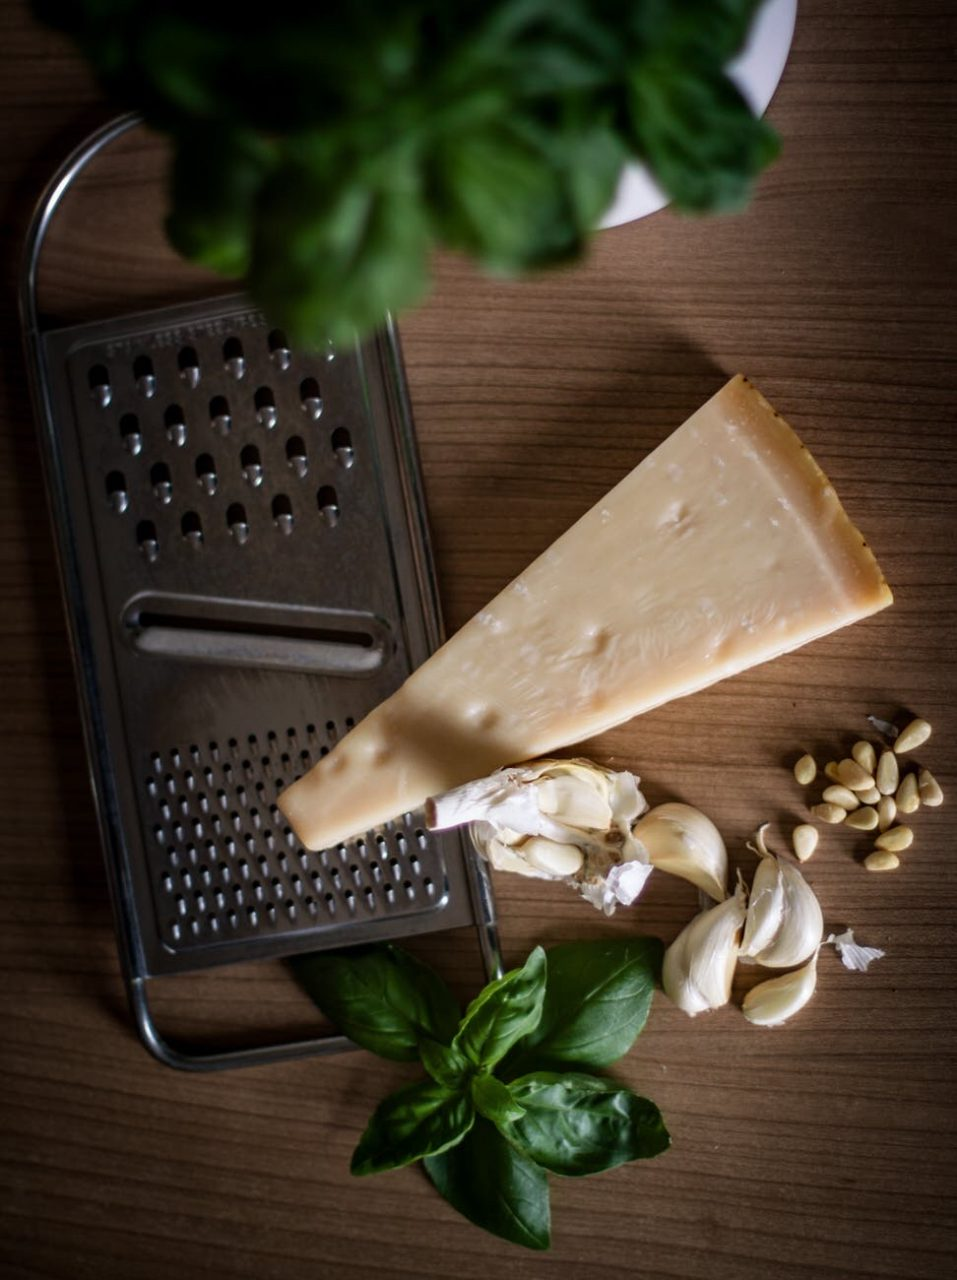 Parmesan, garlic basil